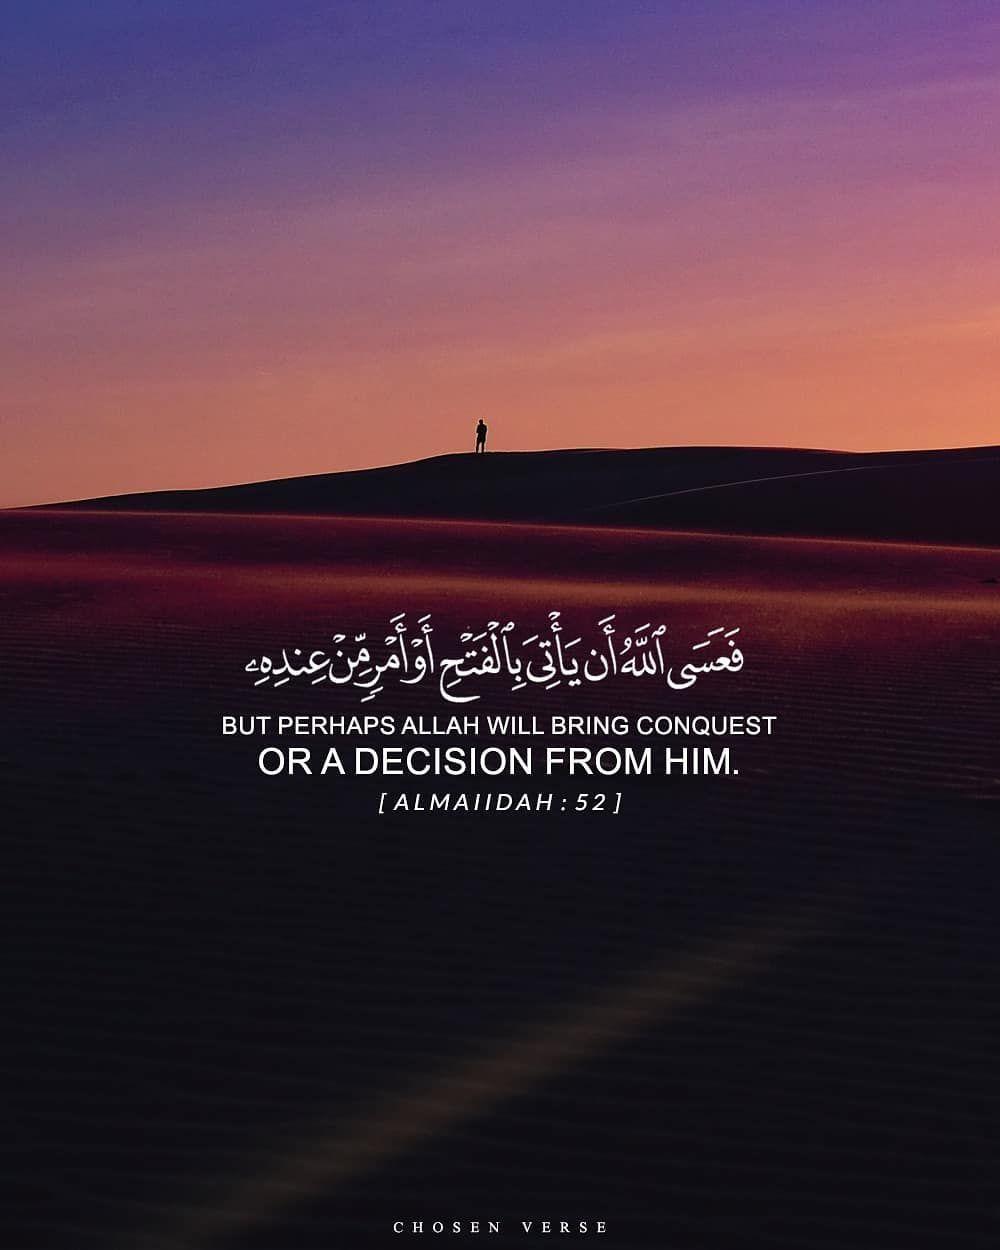 Chosen Verse On Instagram Islamic Quotes Quran Muslim Muslimah قران ايات اذكار اسلاميات Quran Verses Islamic Quotes Quran Learn English